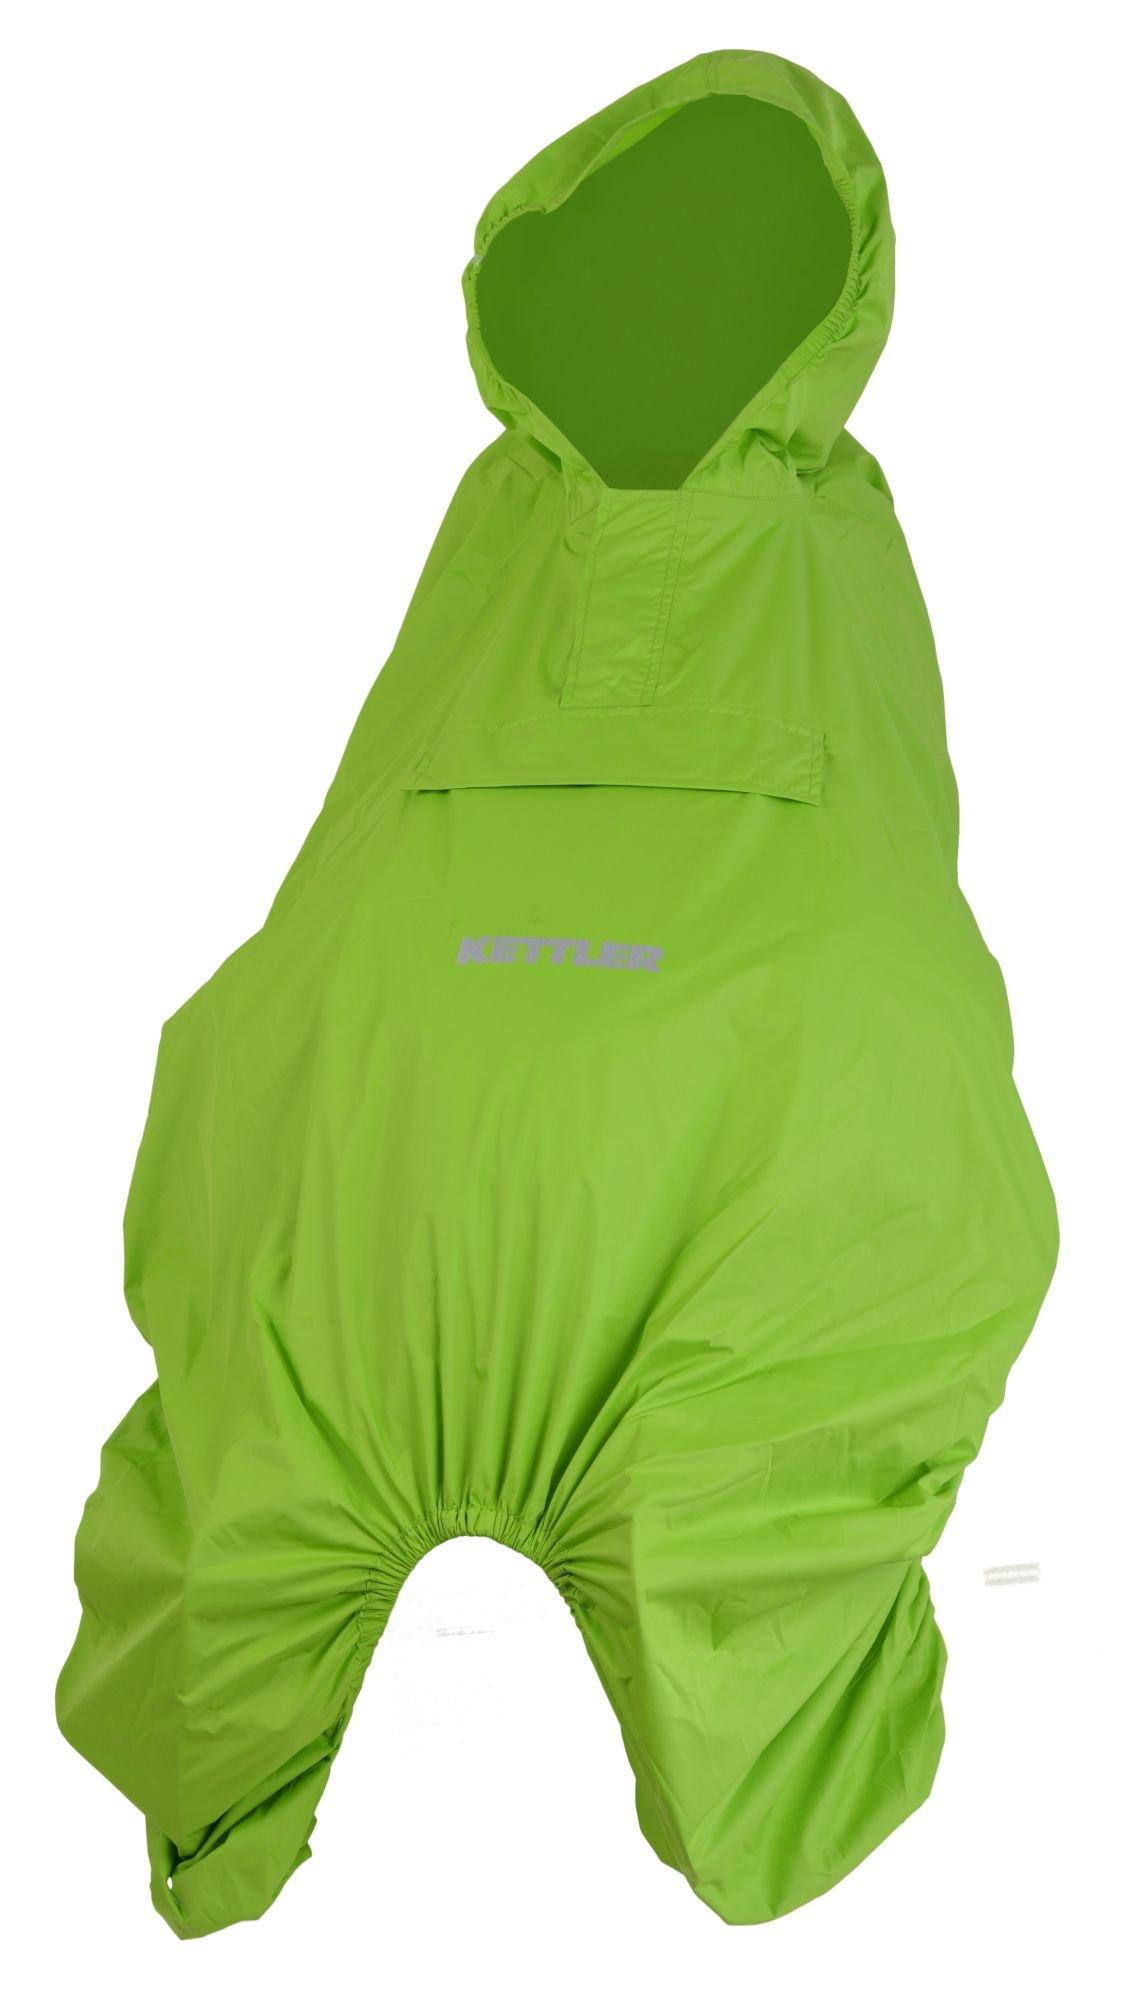 Kettler Regenschutz f. Kindersitze mit Kind